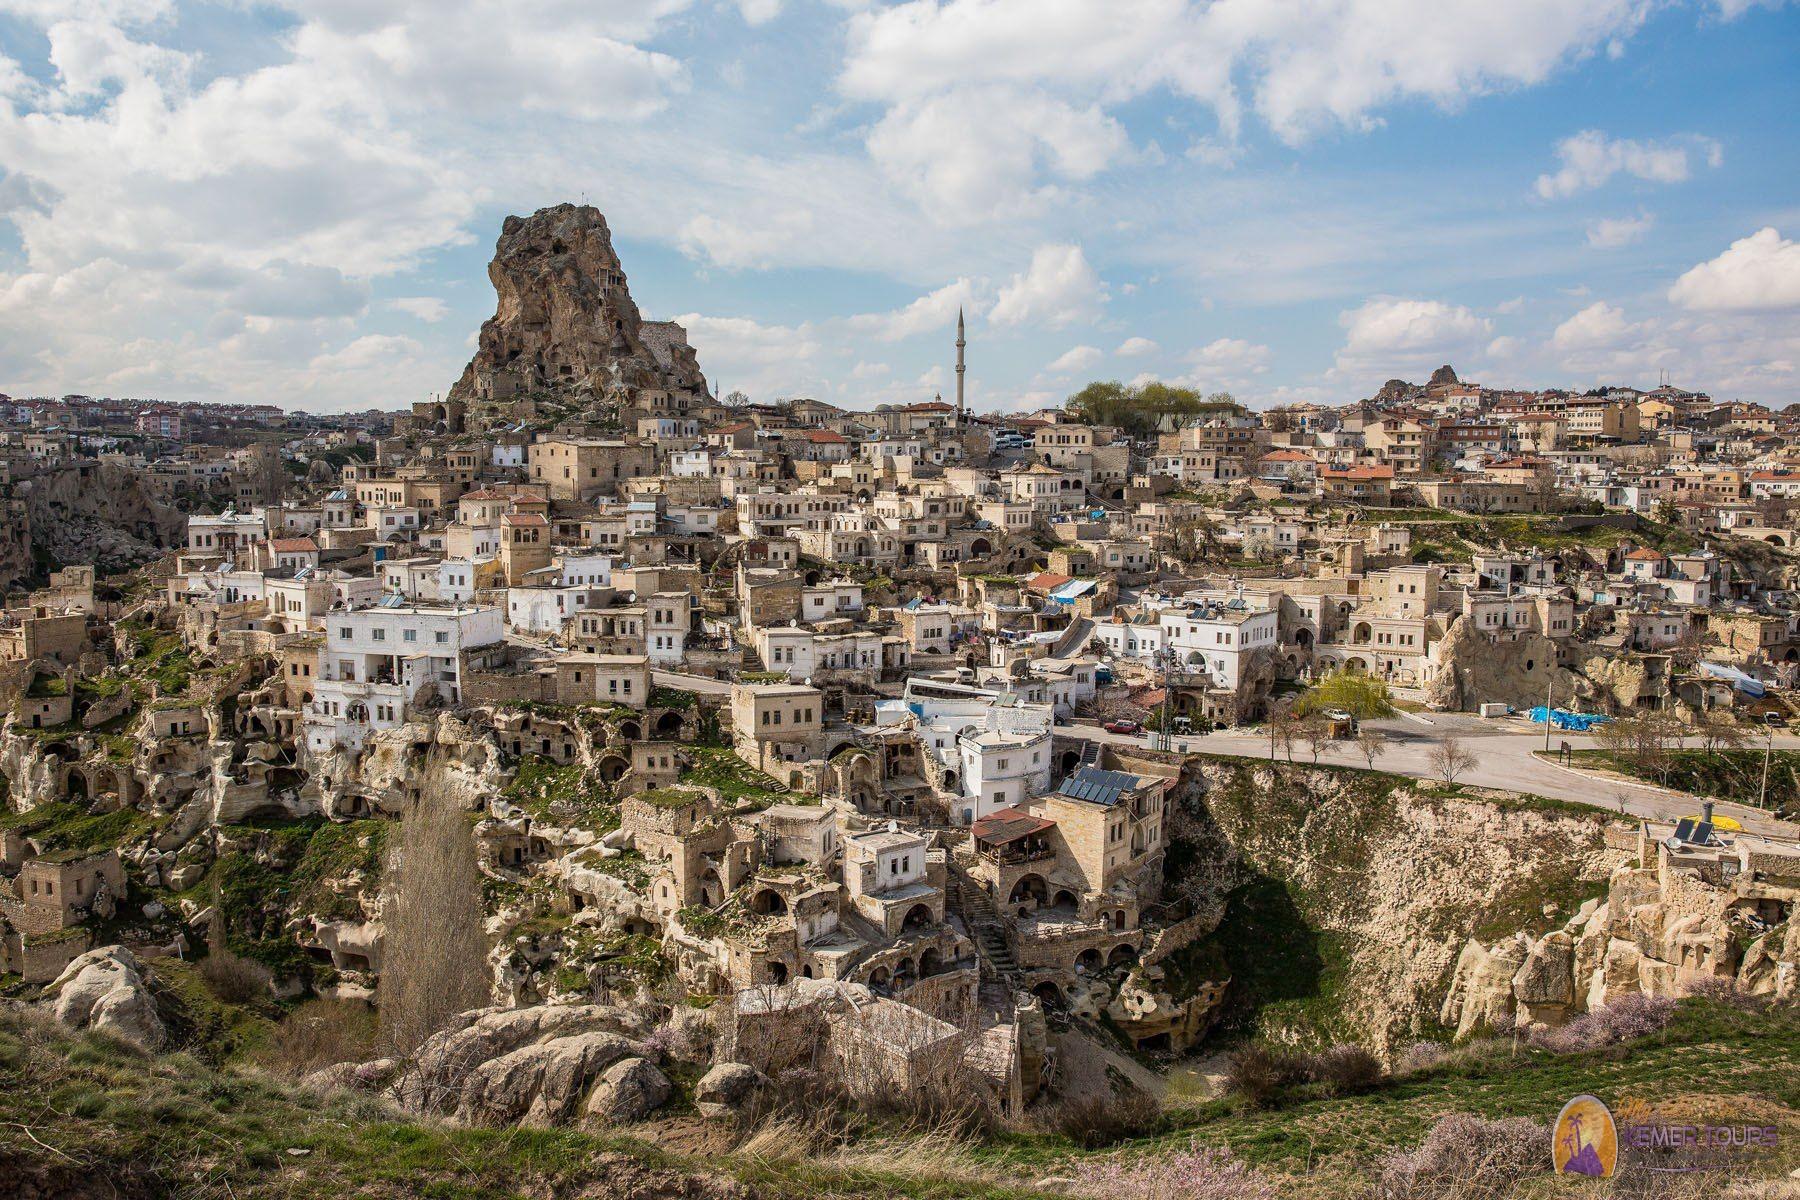 From Kemer to Cappadocia